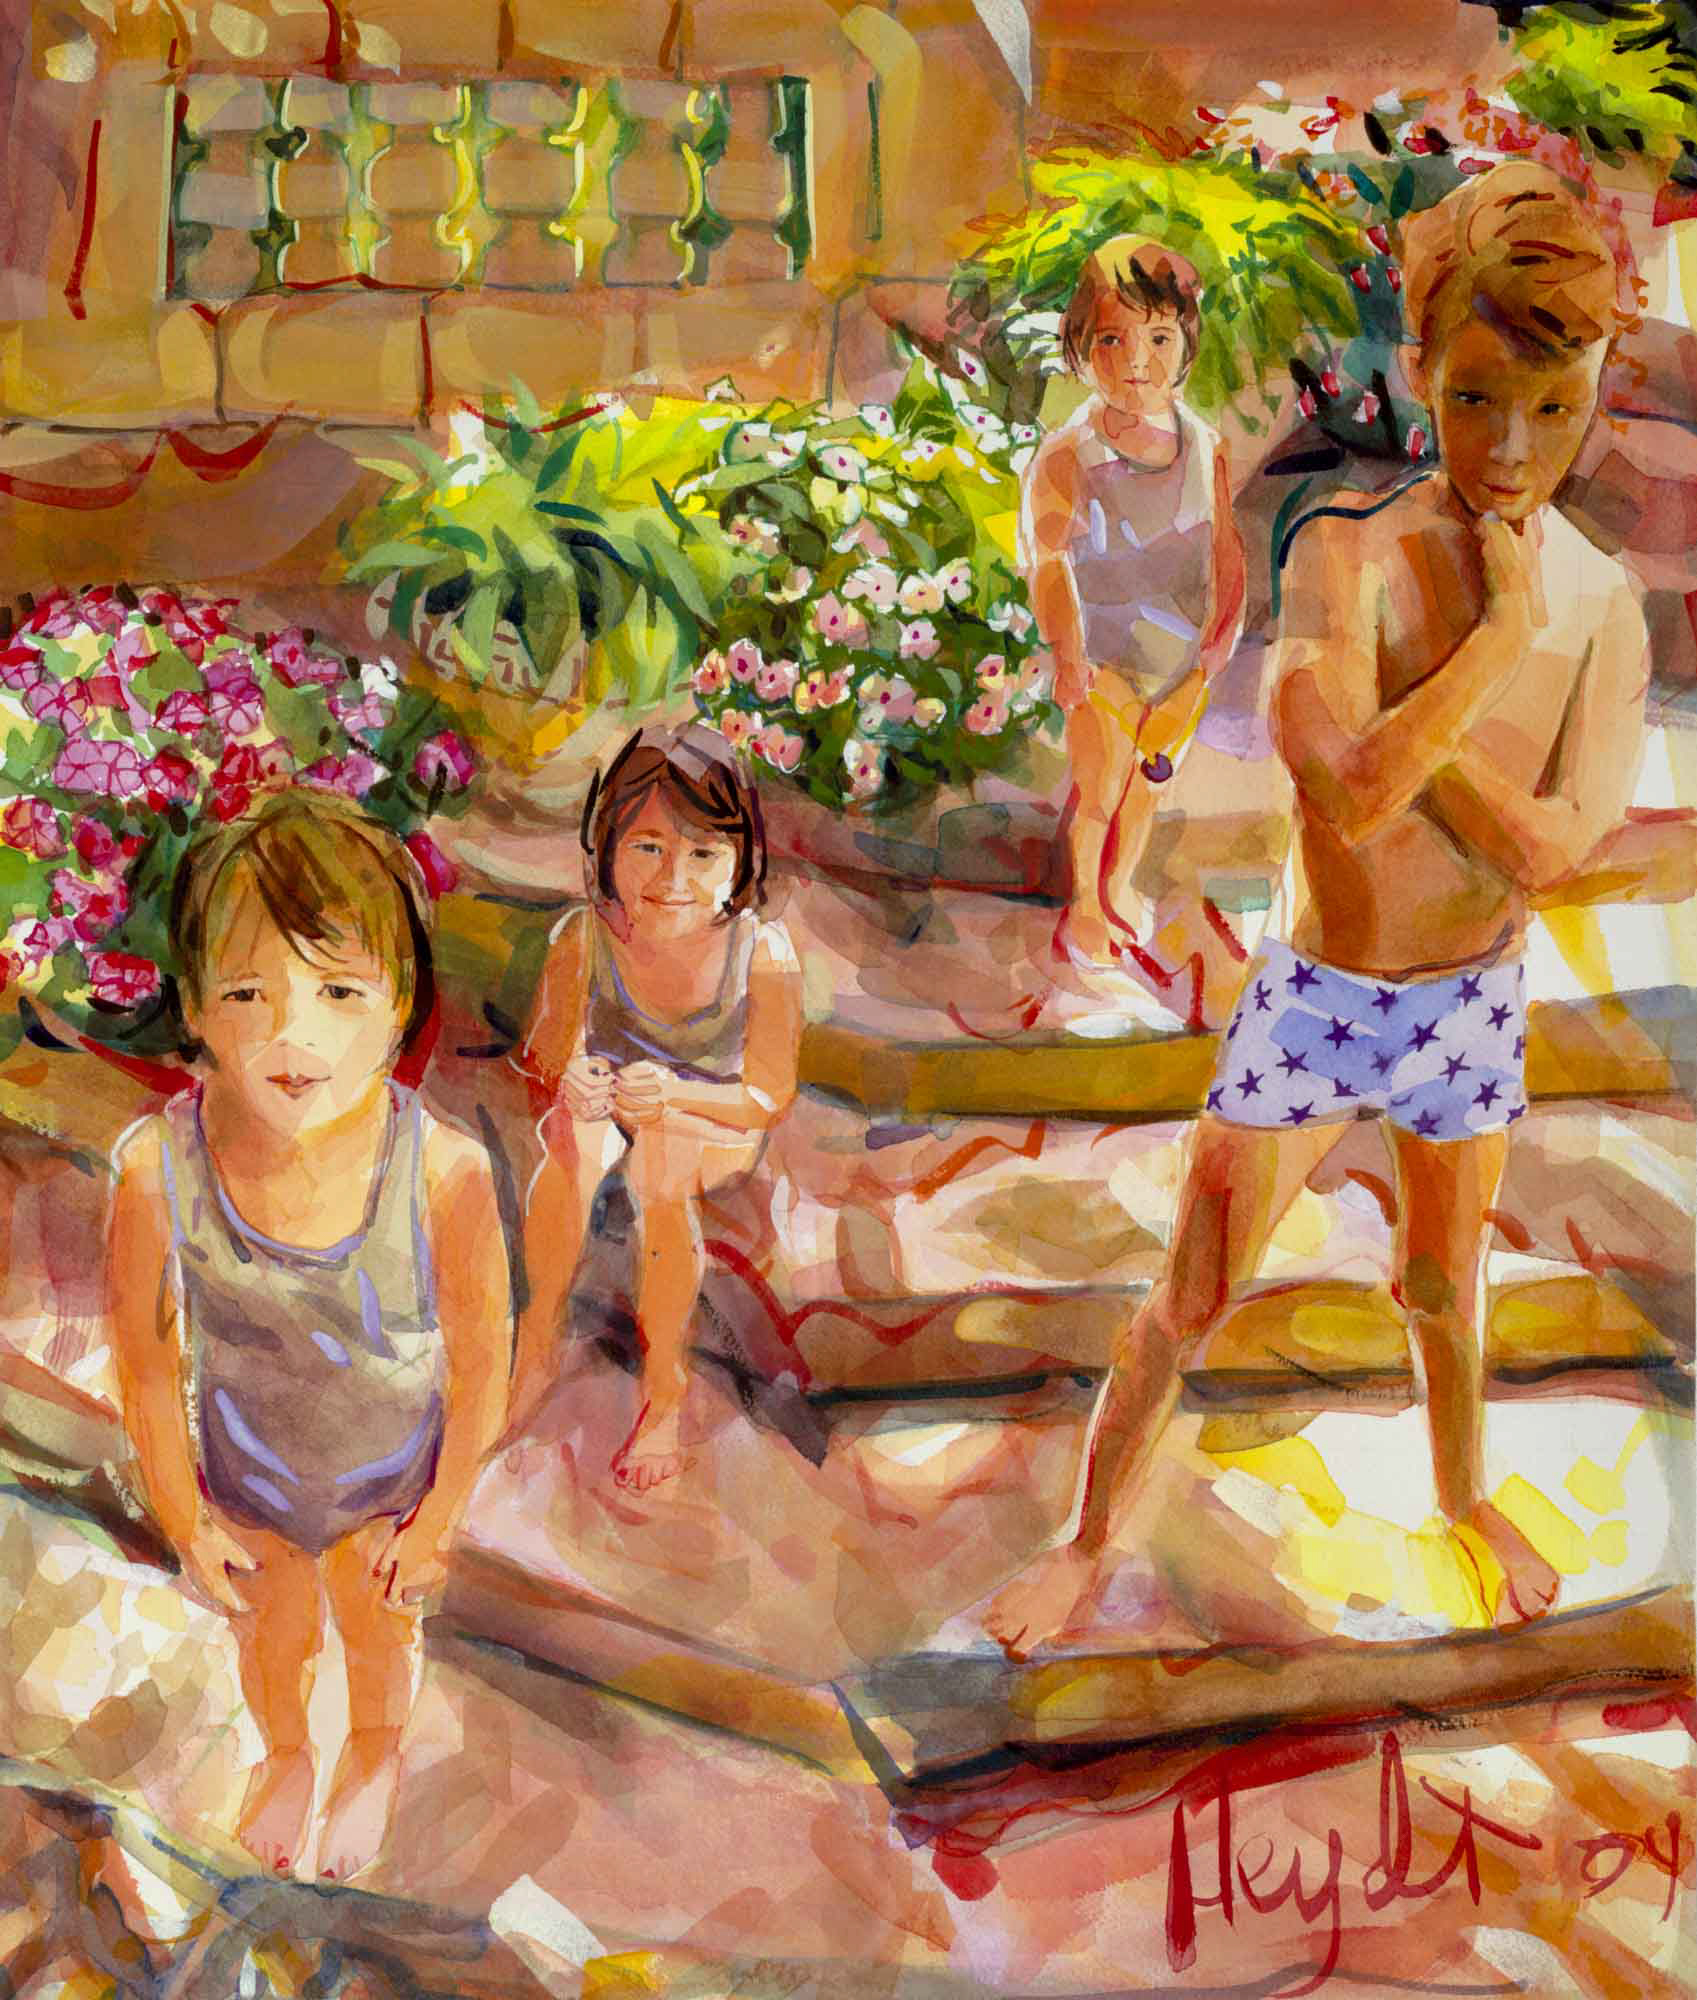 NewportantIII-4 kids in bathing suits.jpg